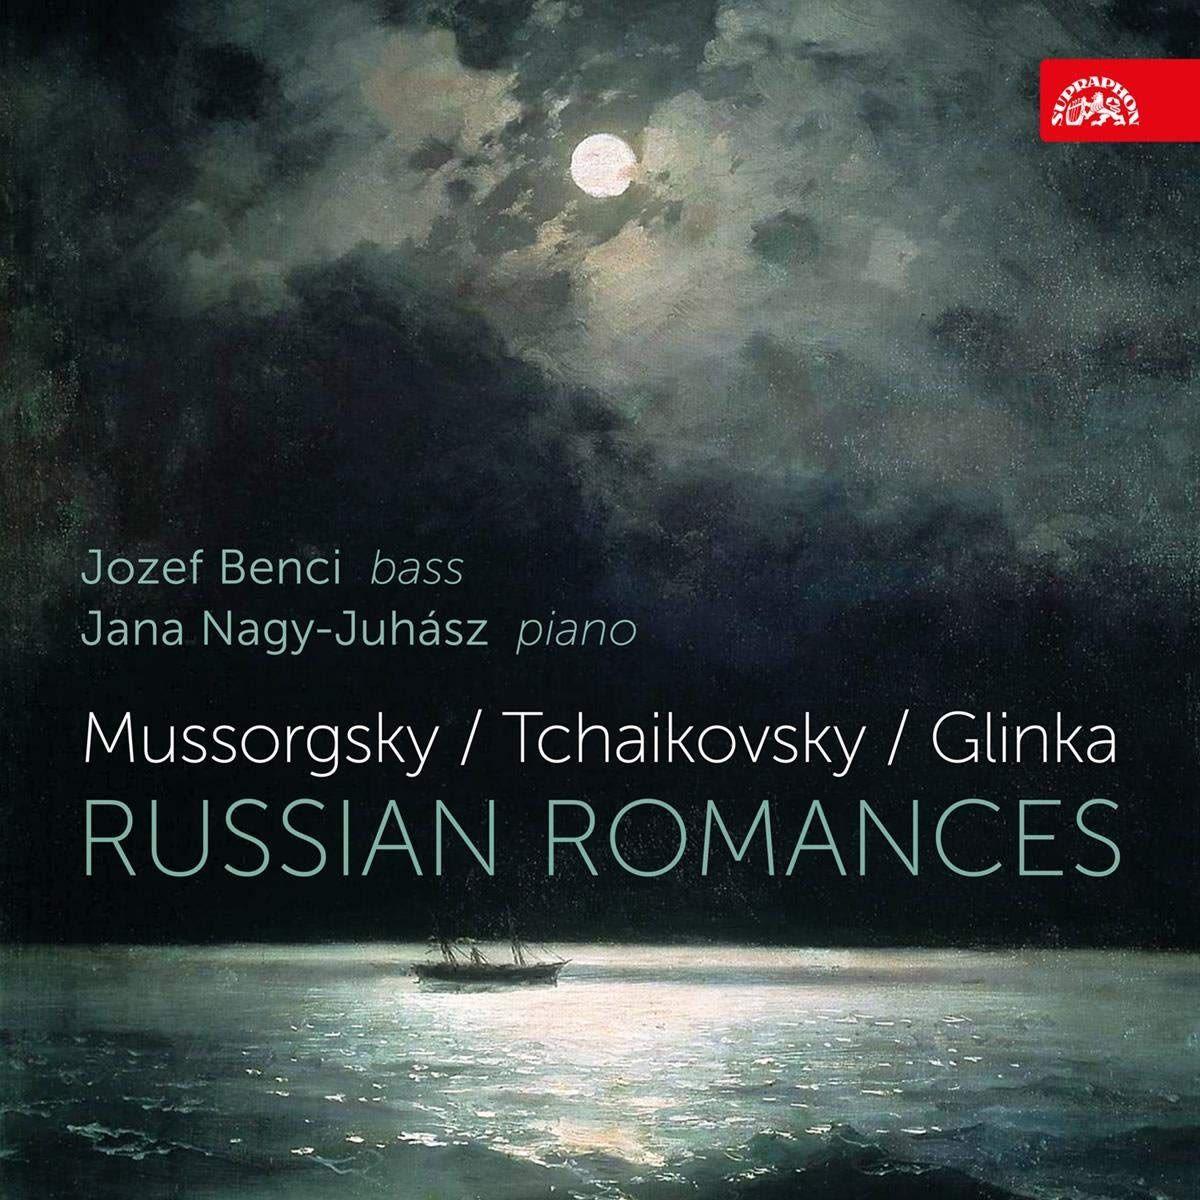 Photo No.1 of Russian Romances: Mussorgsky, Tchaikovsky, Glinka